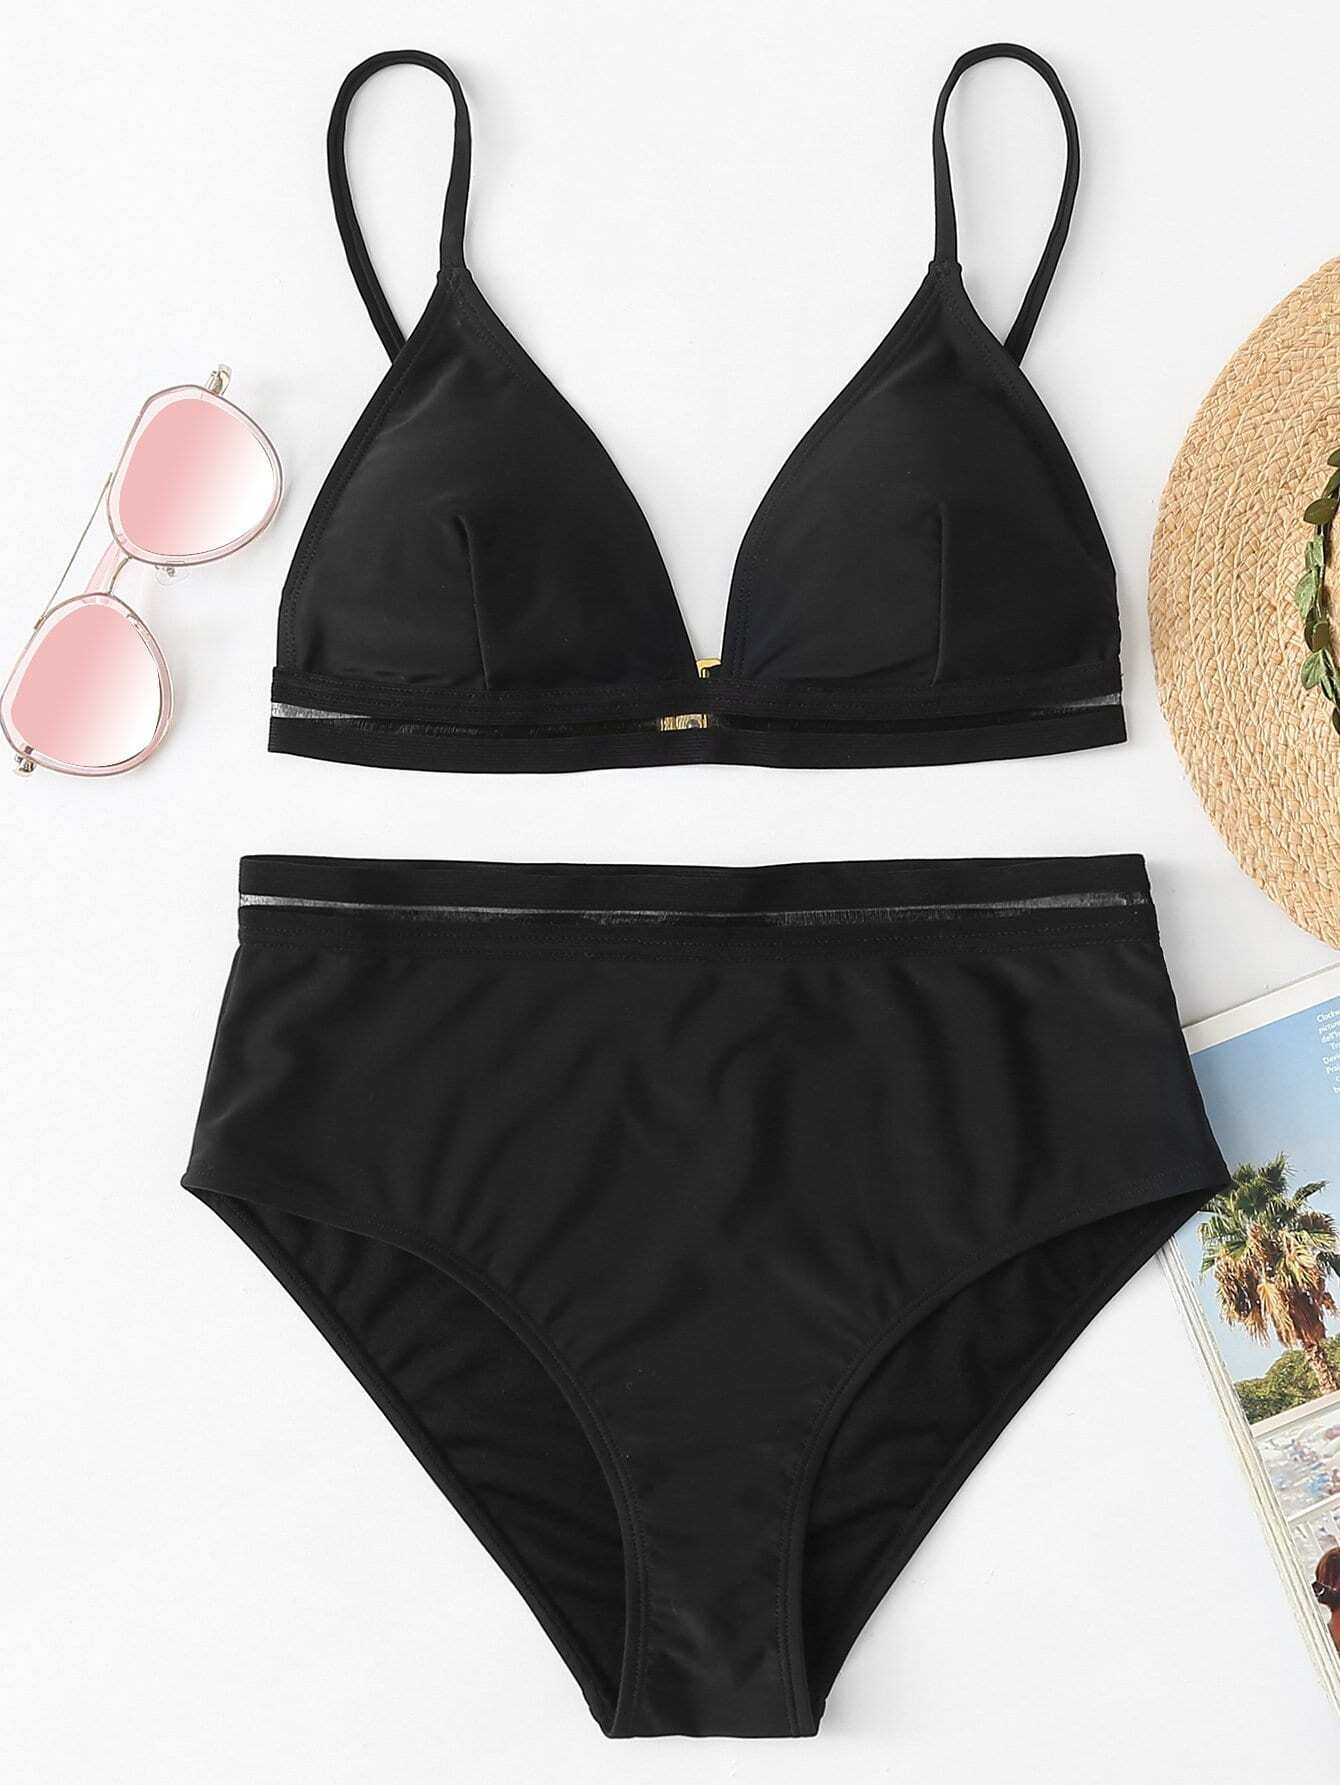 Mesh Insert Triangle Bikini Set eyelet insert botanical print bikini set